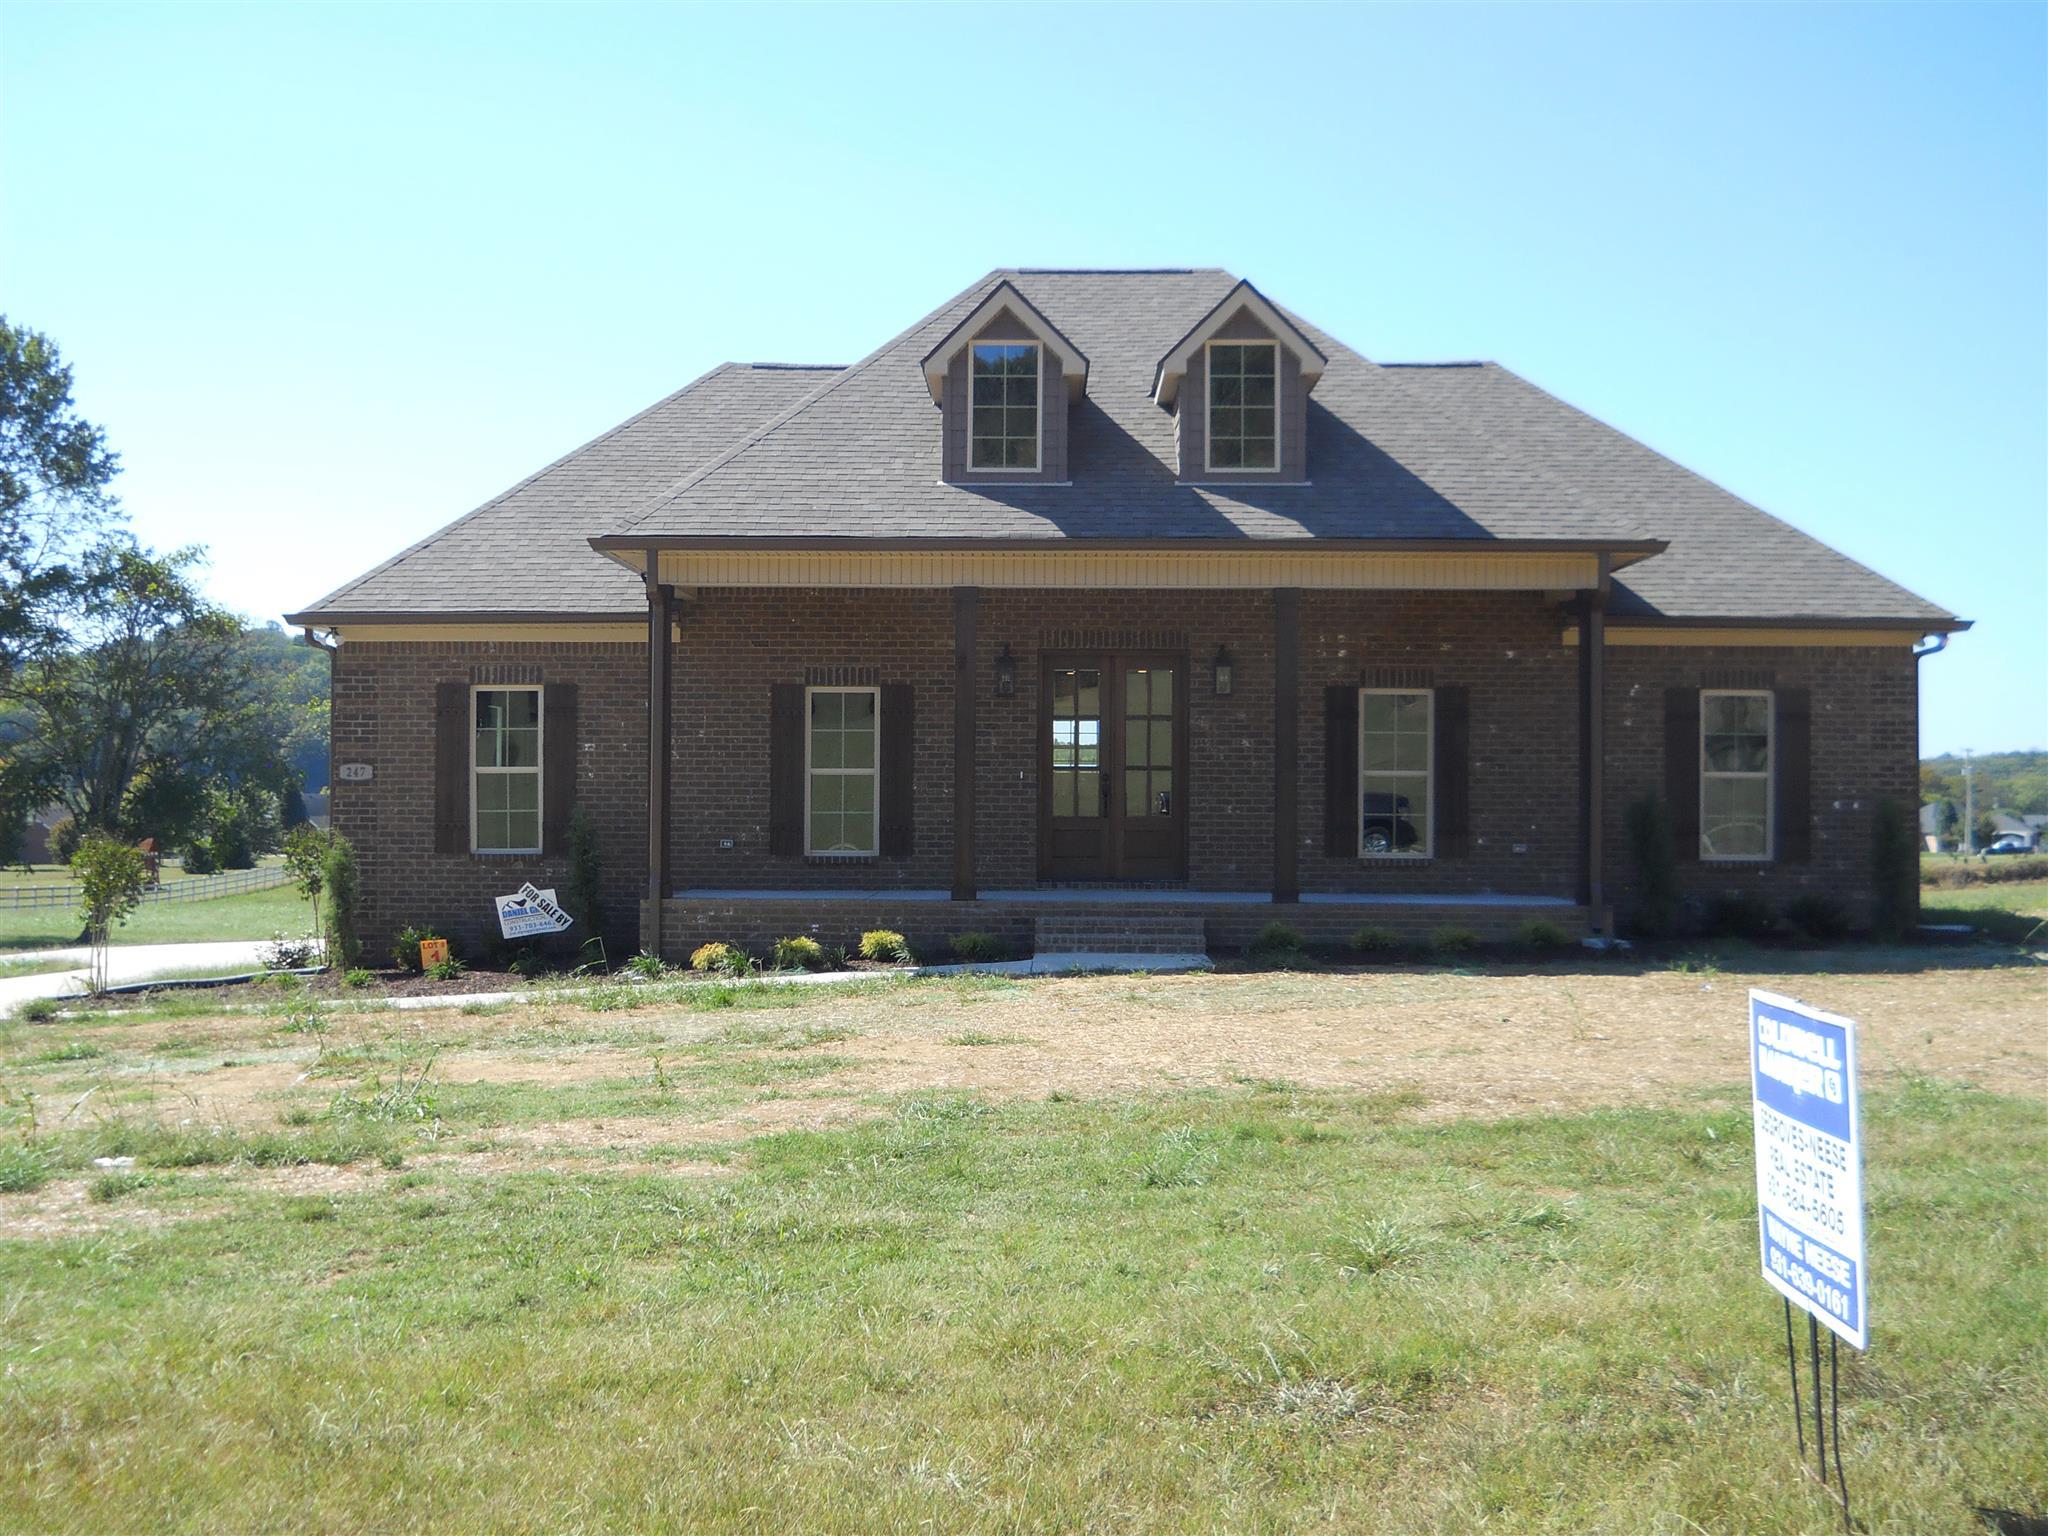 247 Barton Dr, Normandy, TN 37360 - Normandy, TN real estate listing